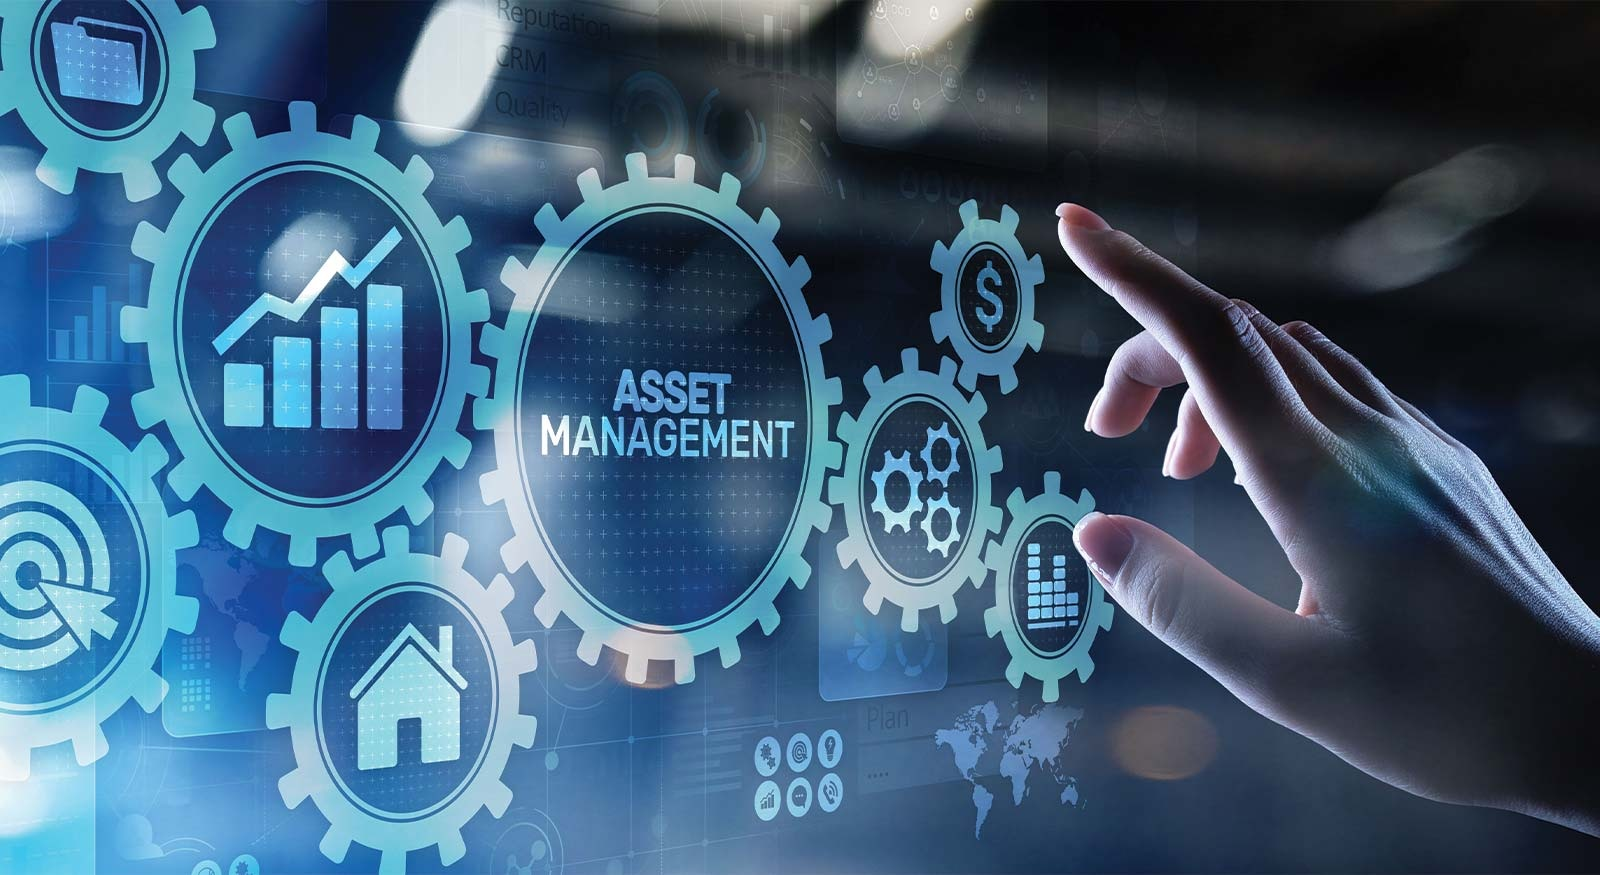 Universal Asset Management Tokyo Japan